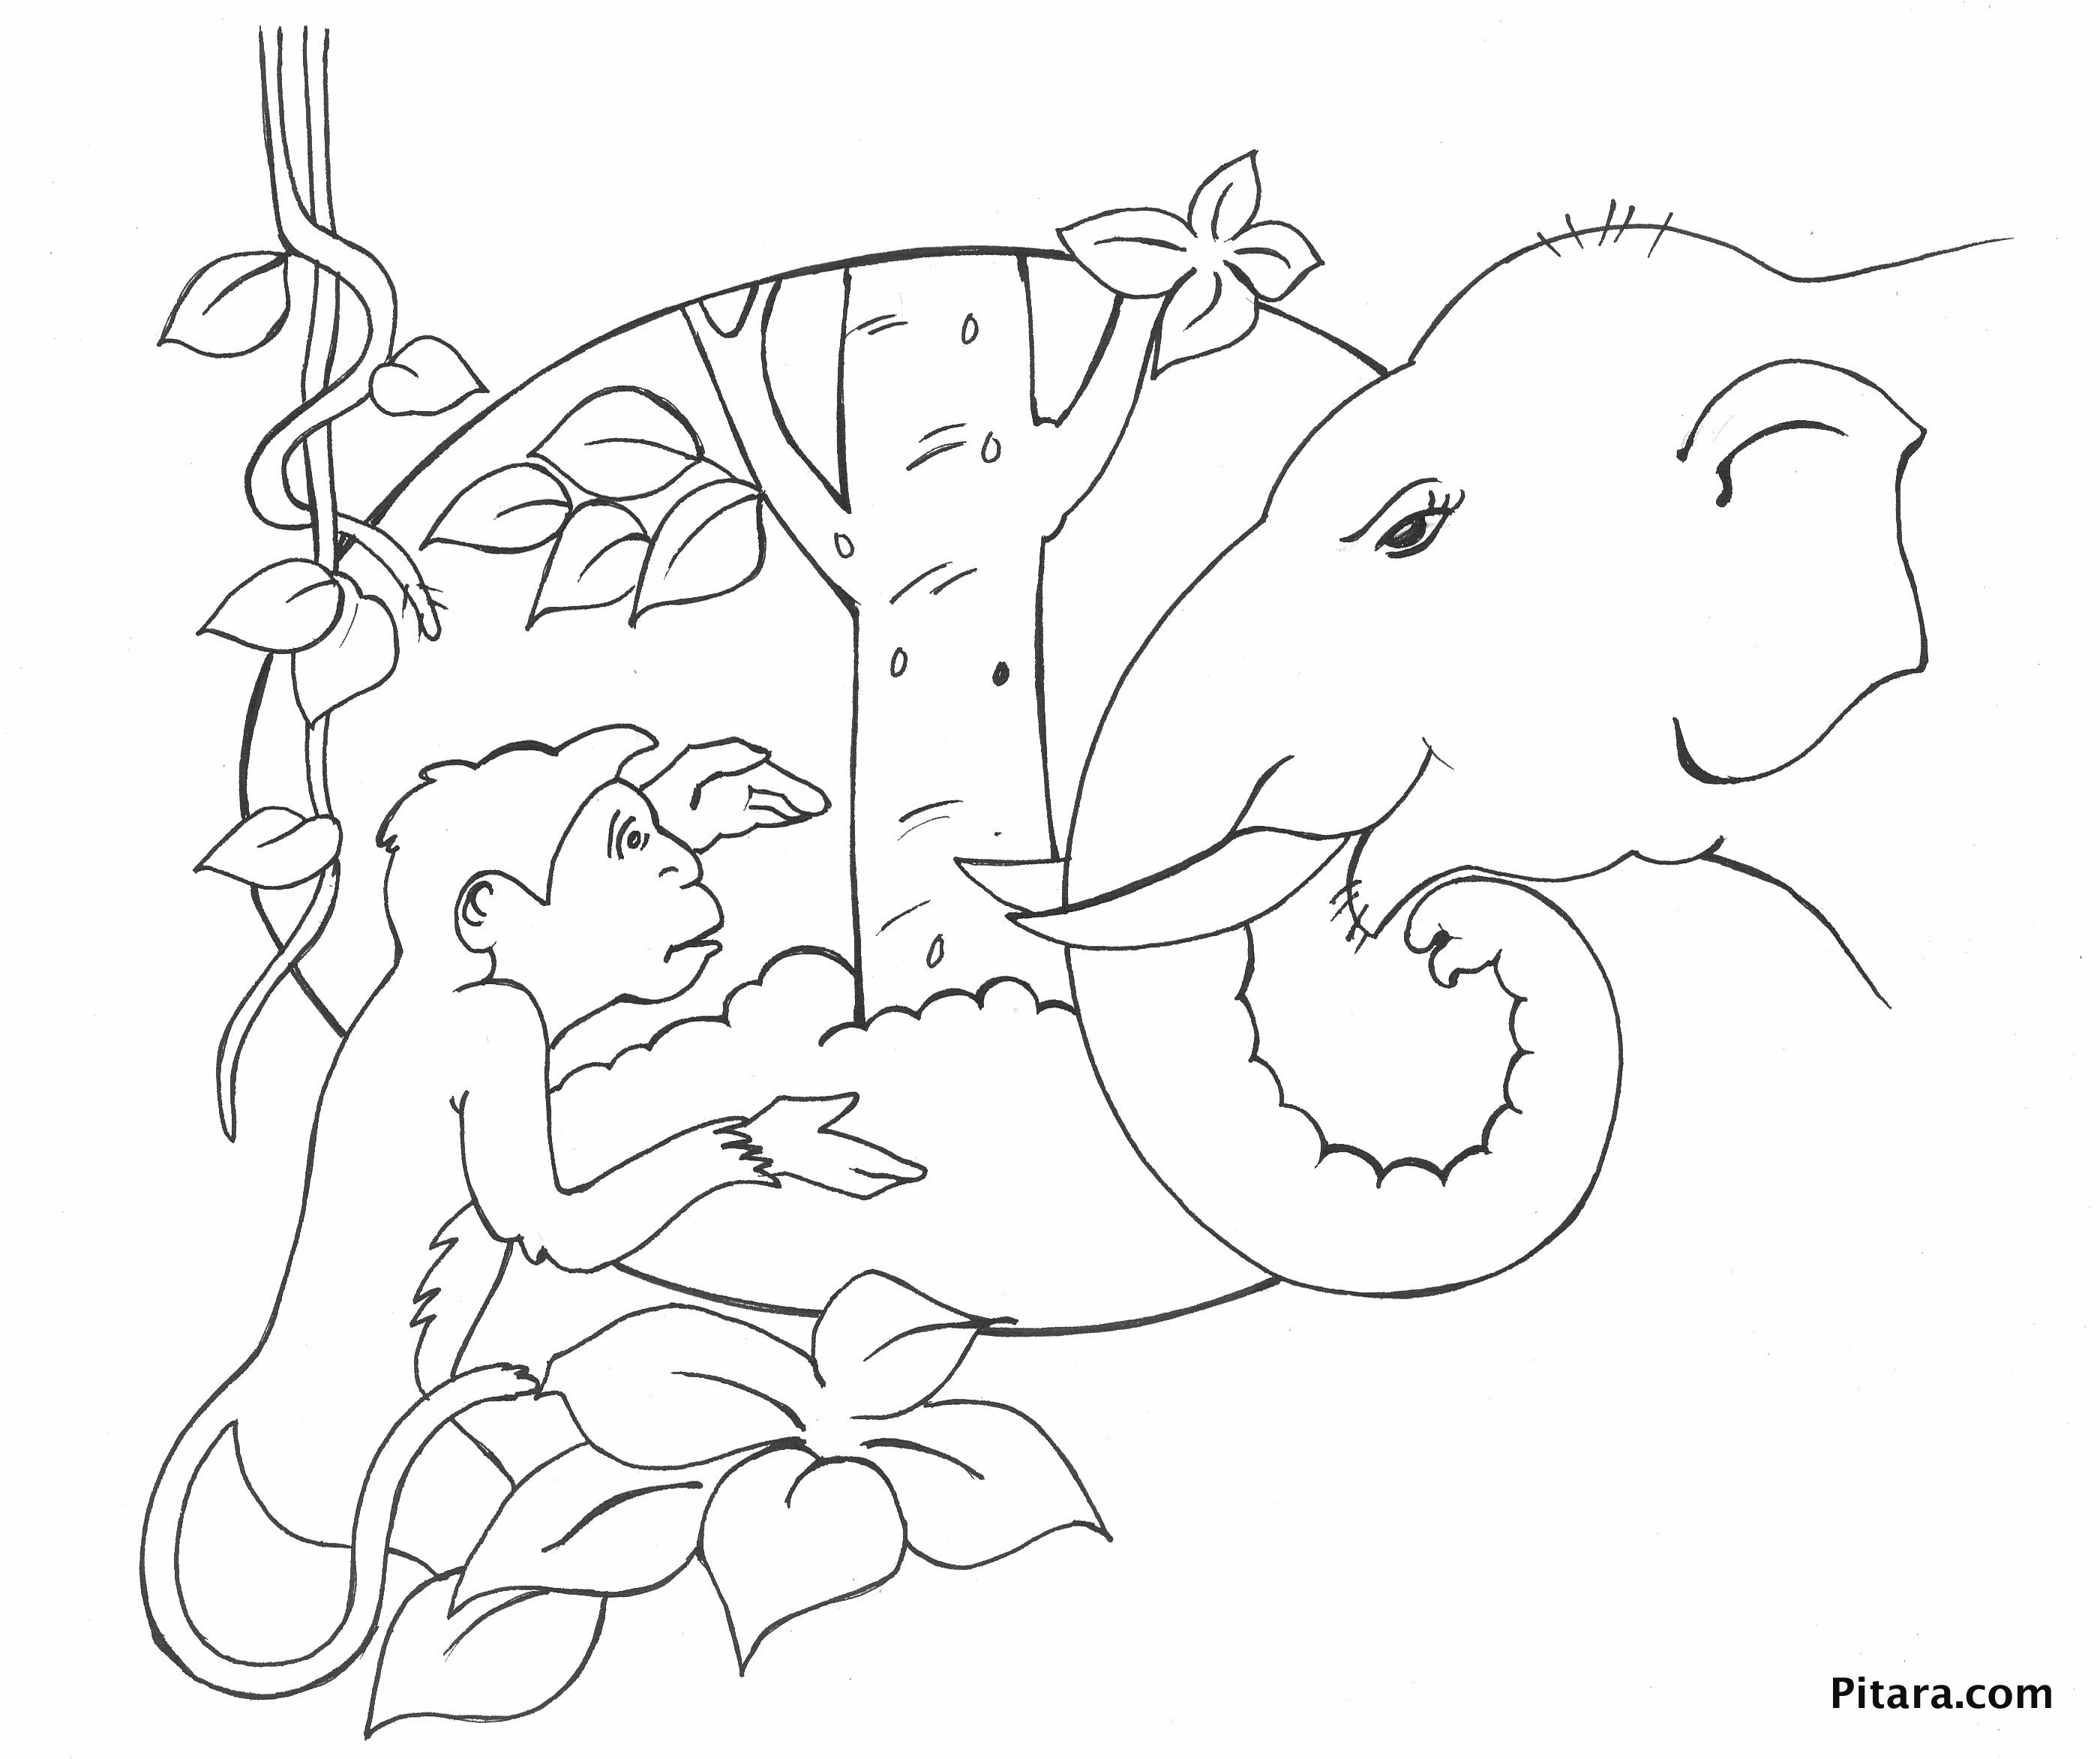 Monkey & elephant – Coloring page